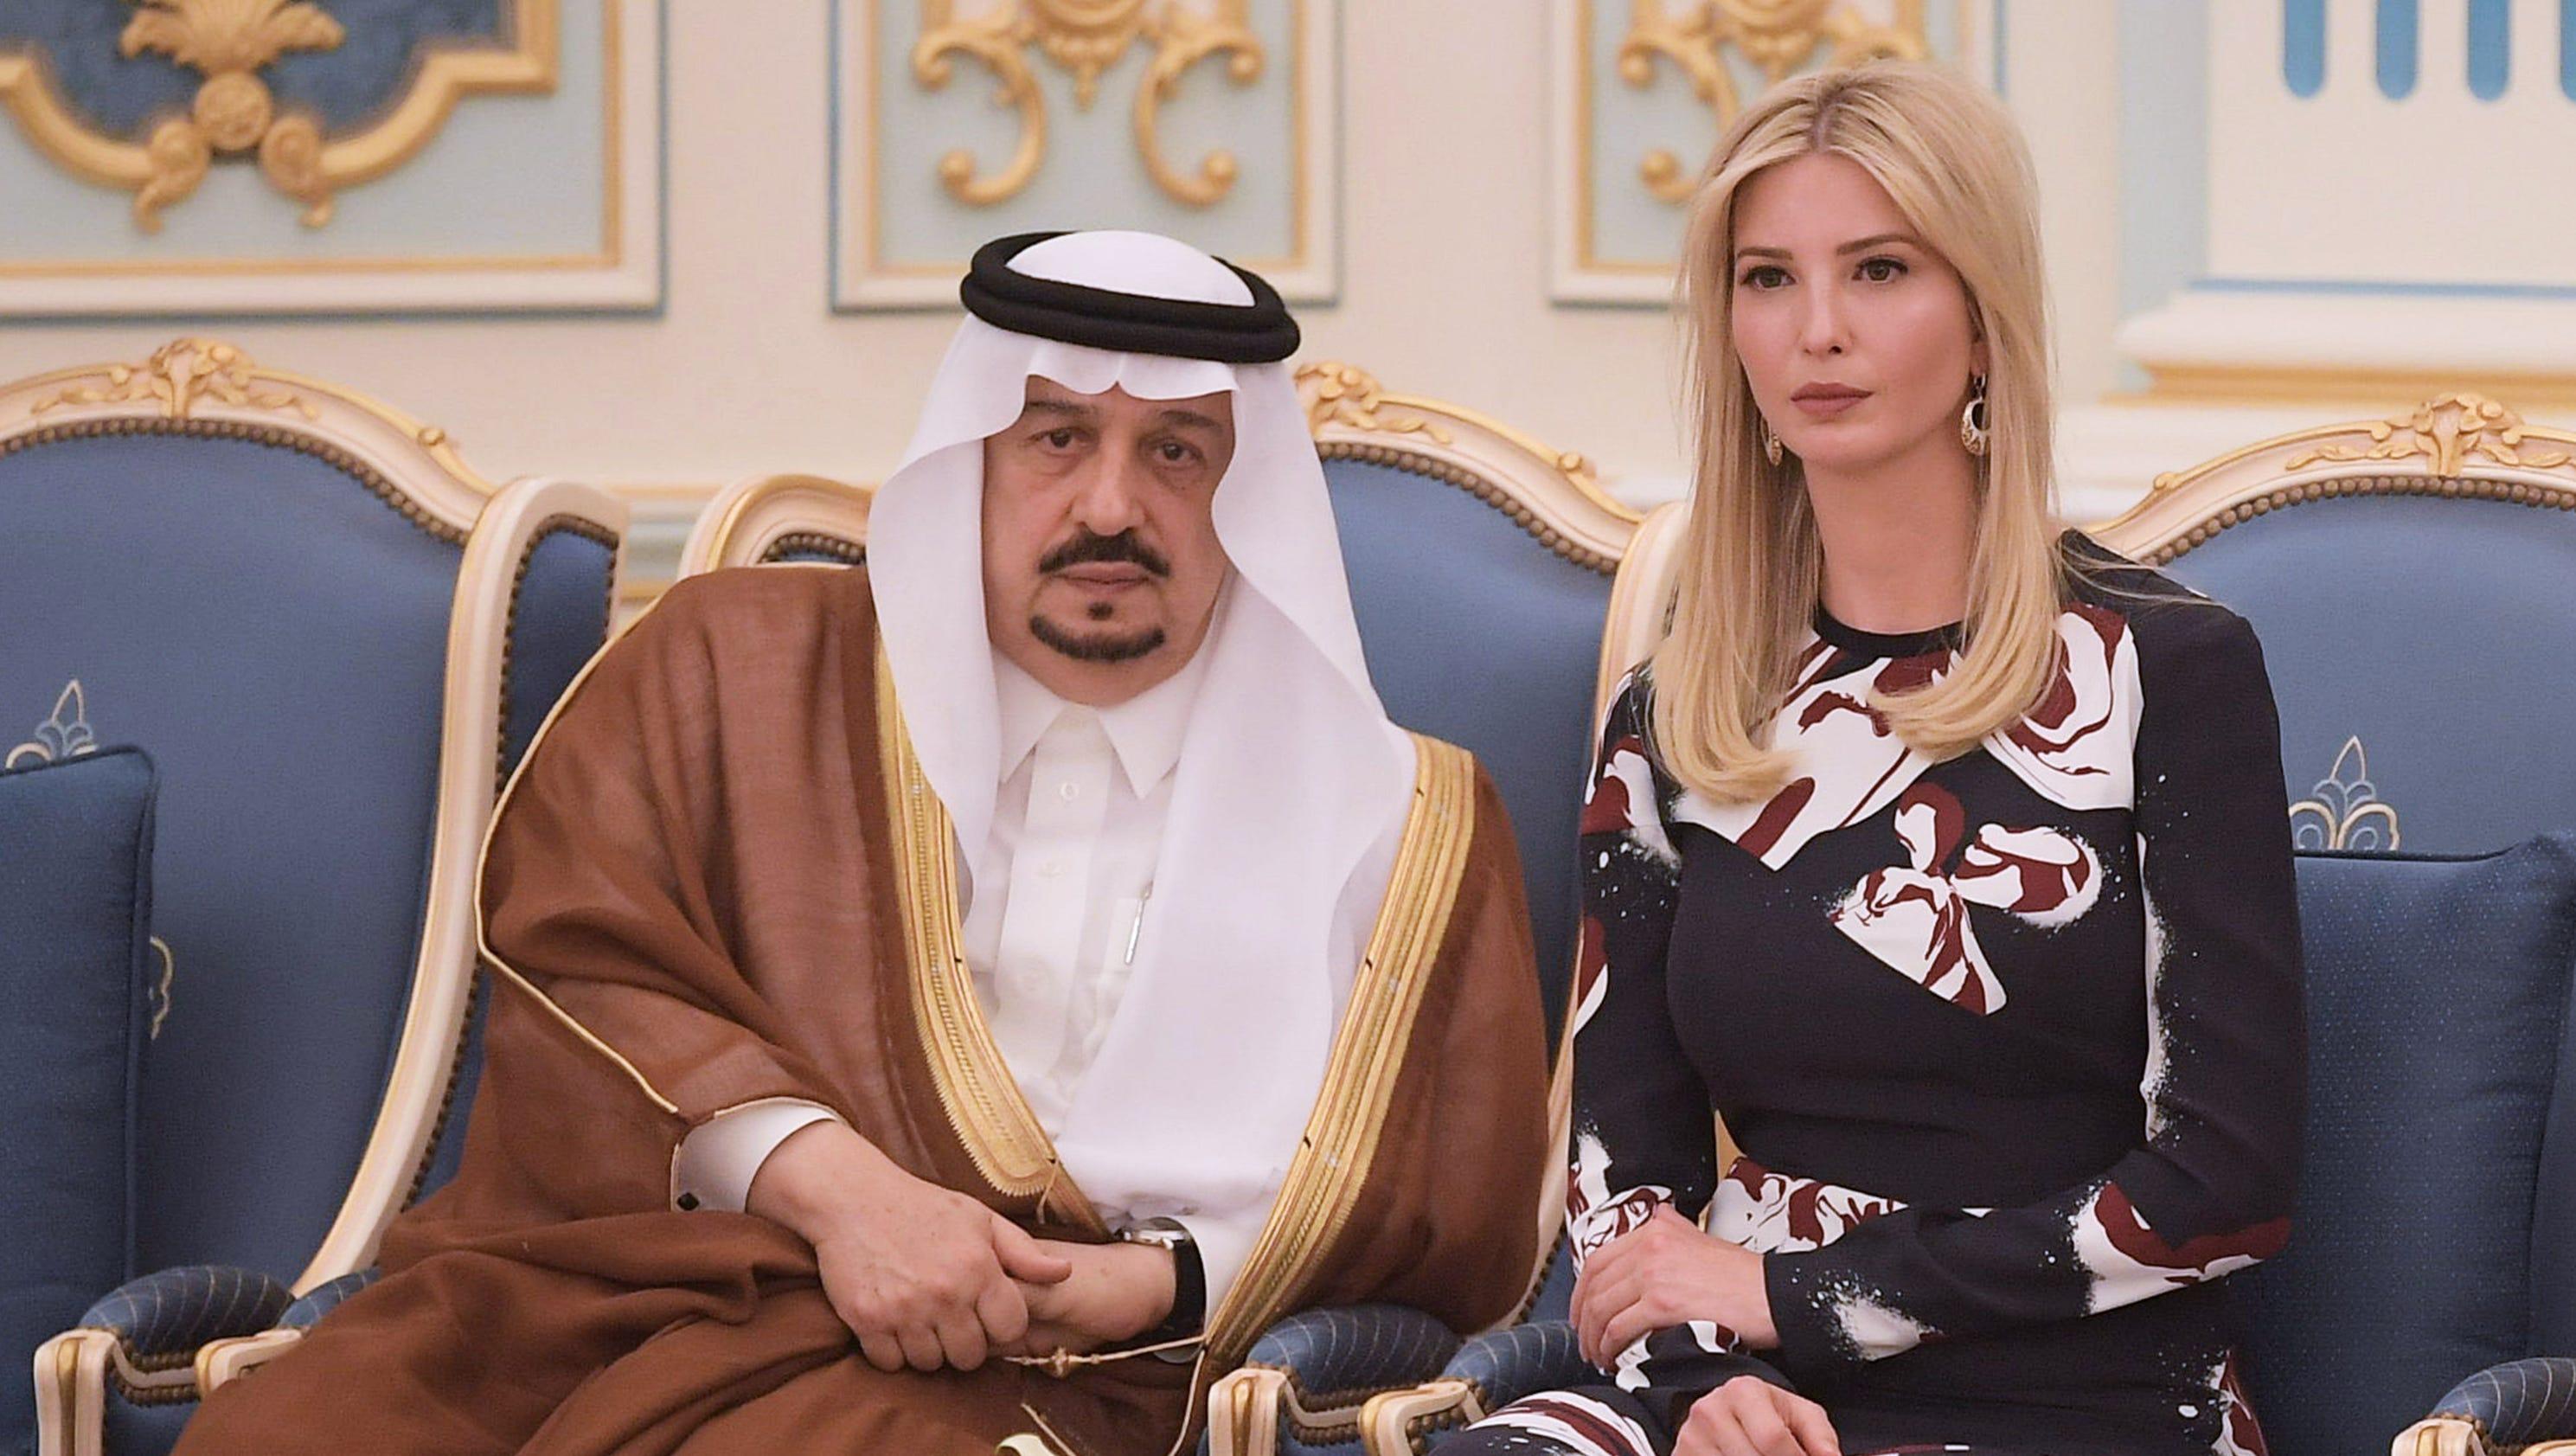 Ivanka Trump praises Saudi Arabia's progress on women's rights